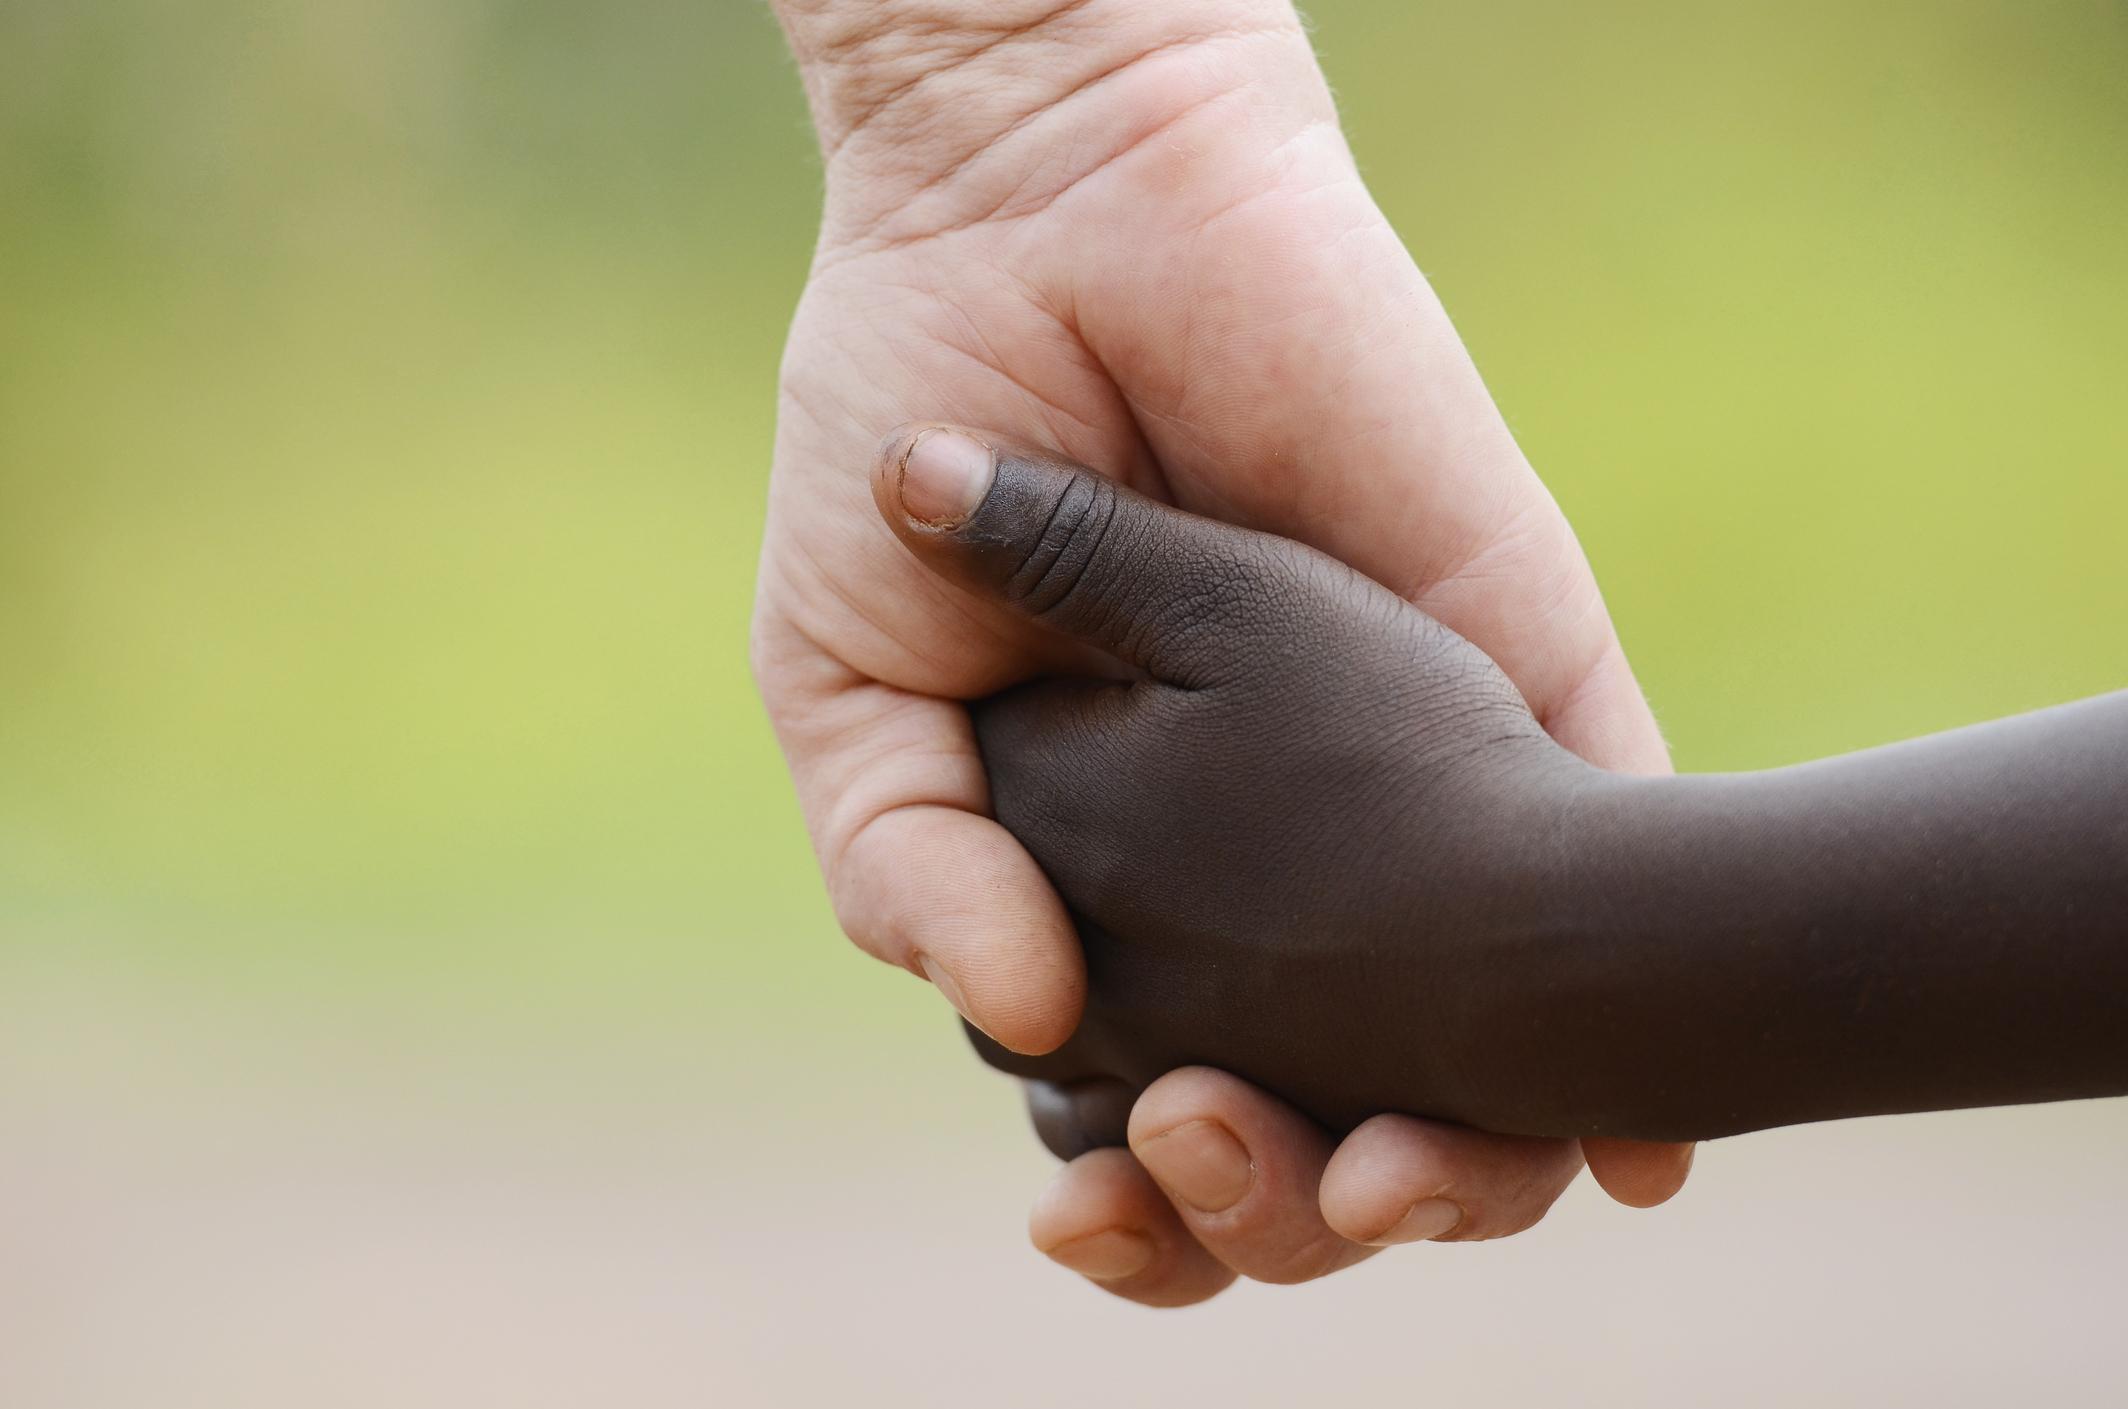 Gender inequality drives HIV epidemic in sub-Saharan Africa